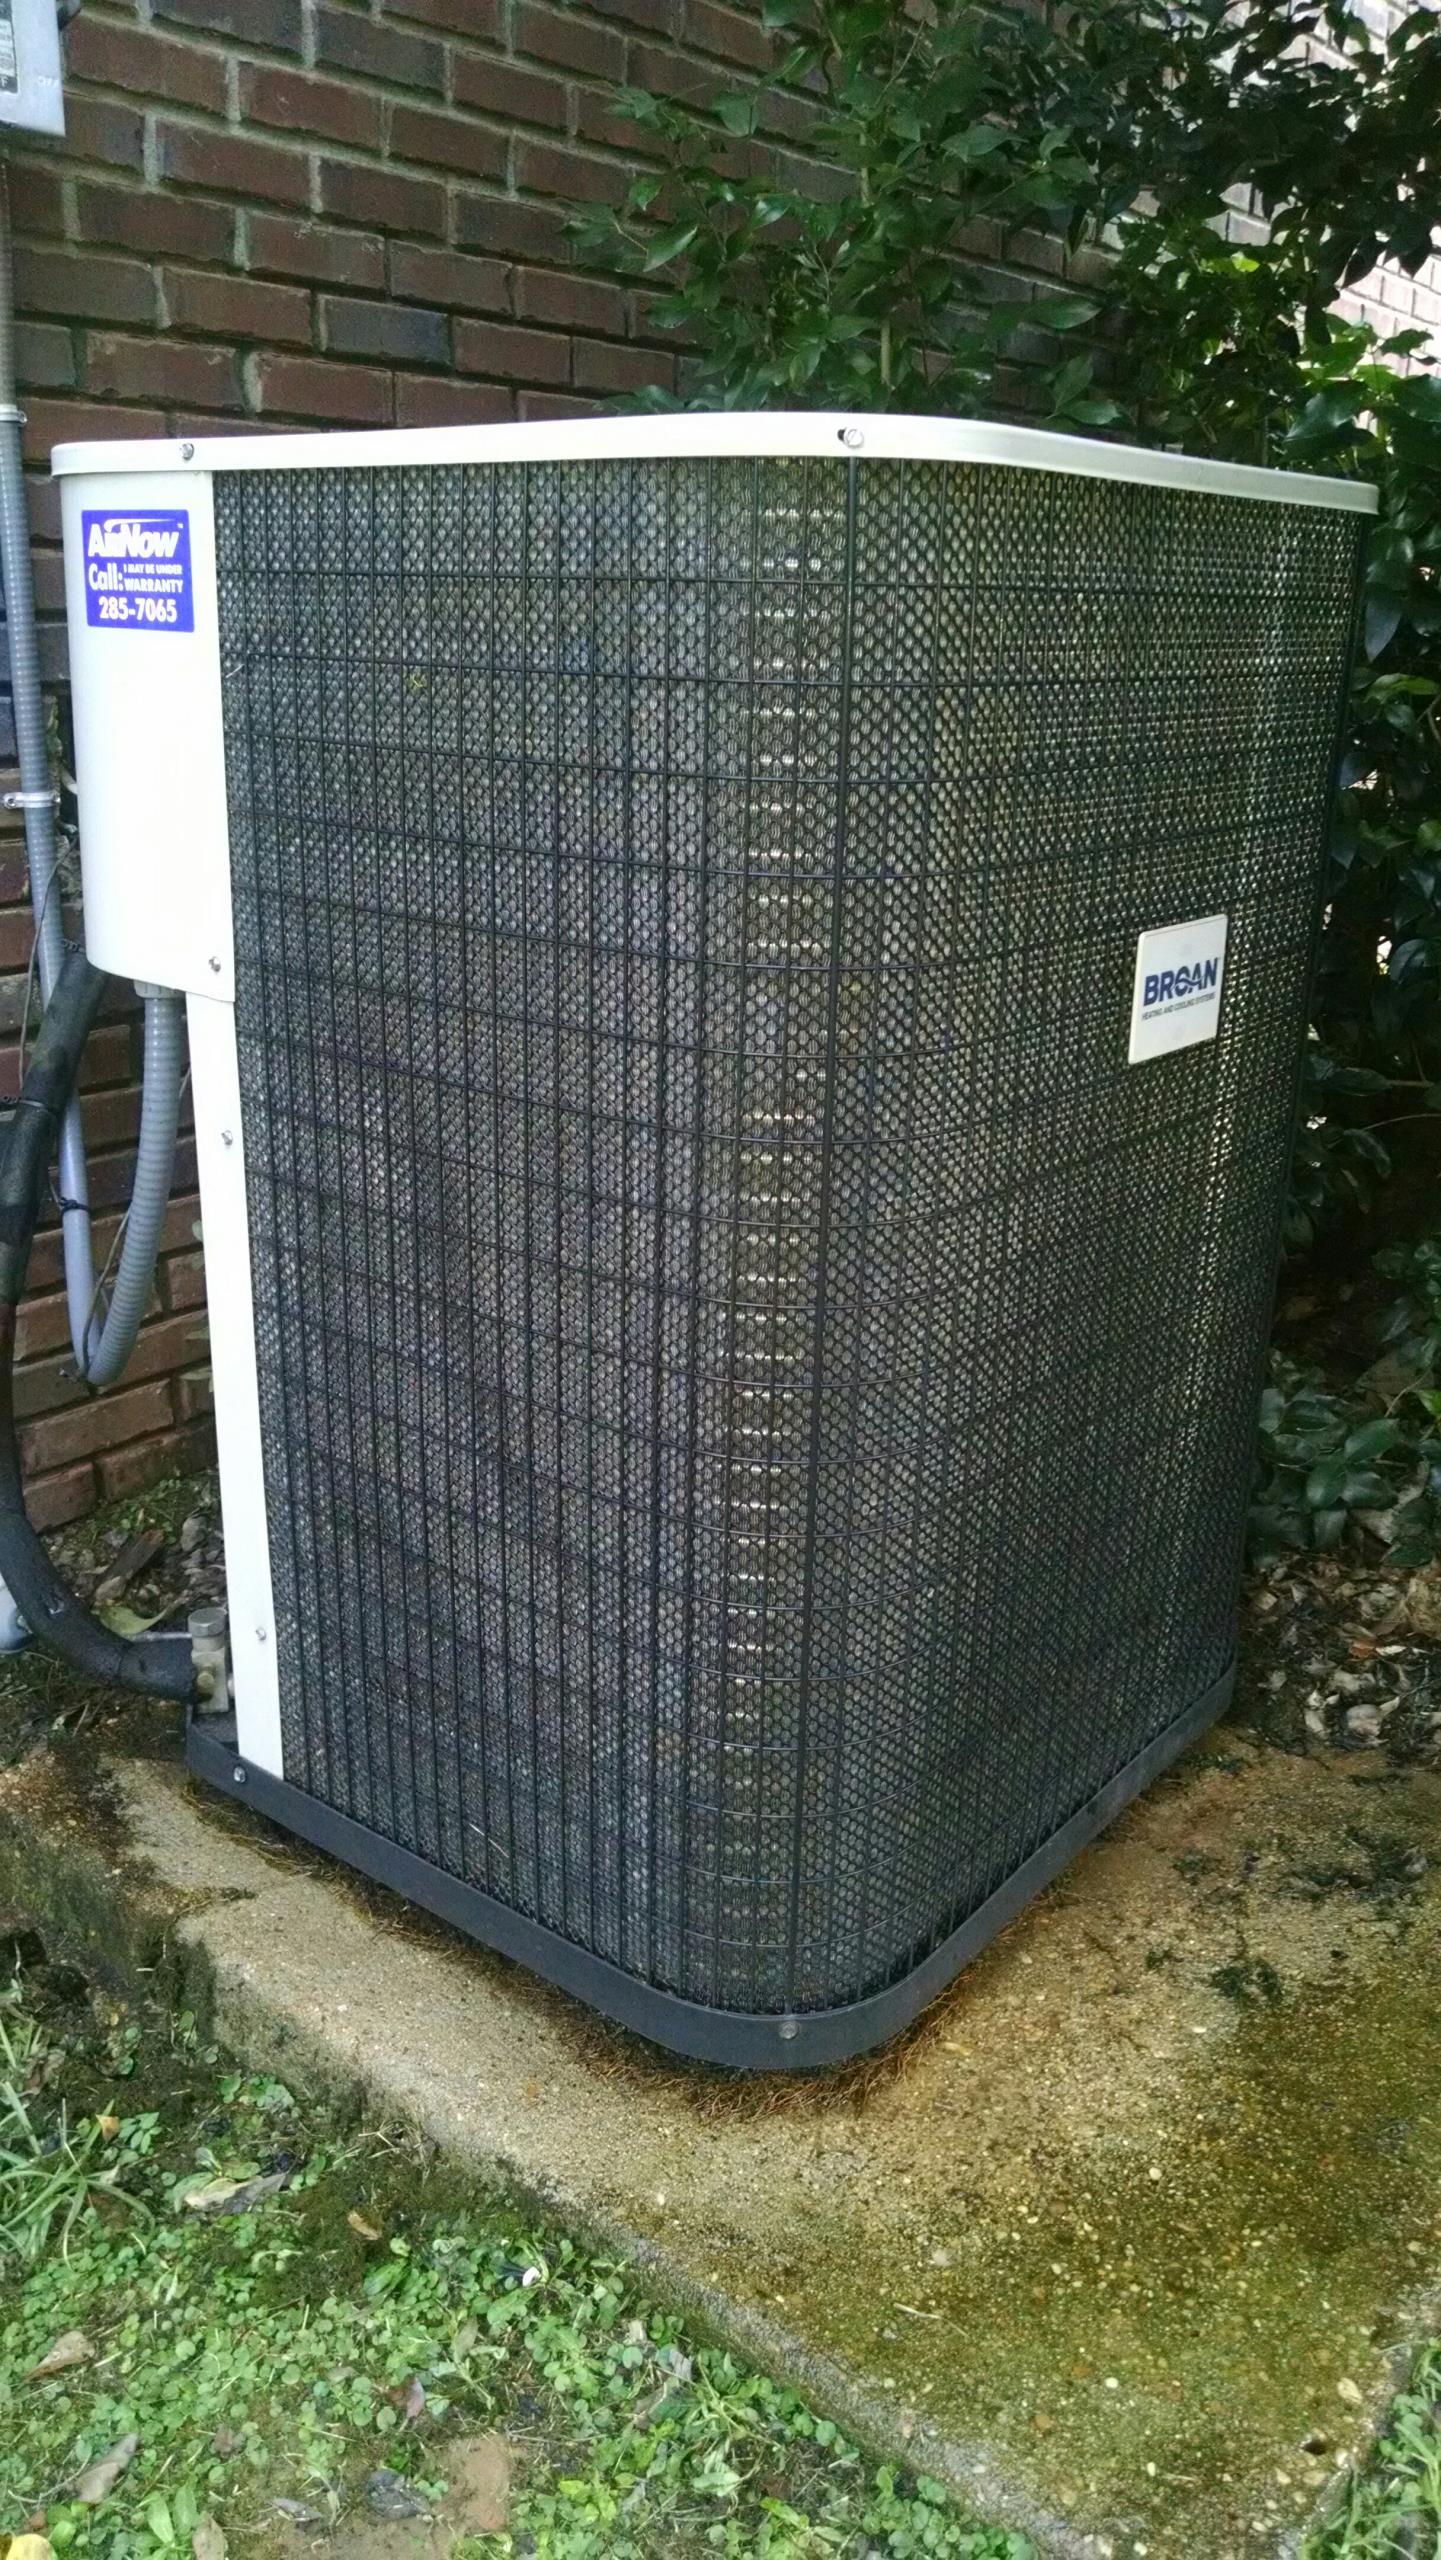 Deatsville, AL - Home Sale Inspection of 4 yr old Broan Heat pump